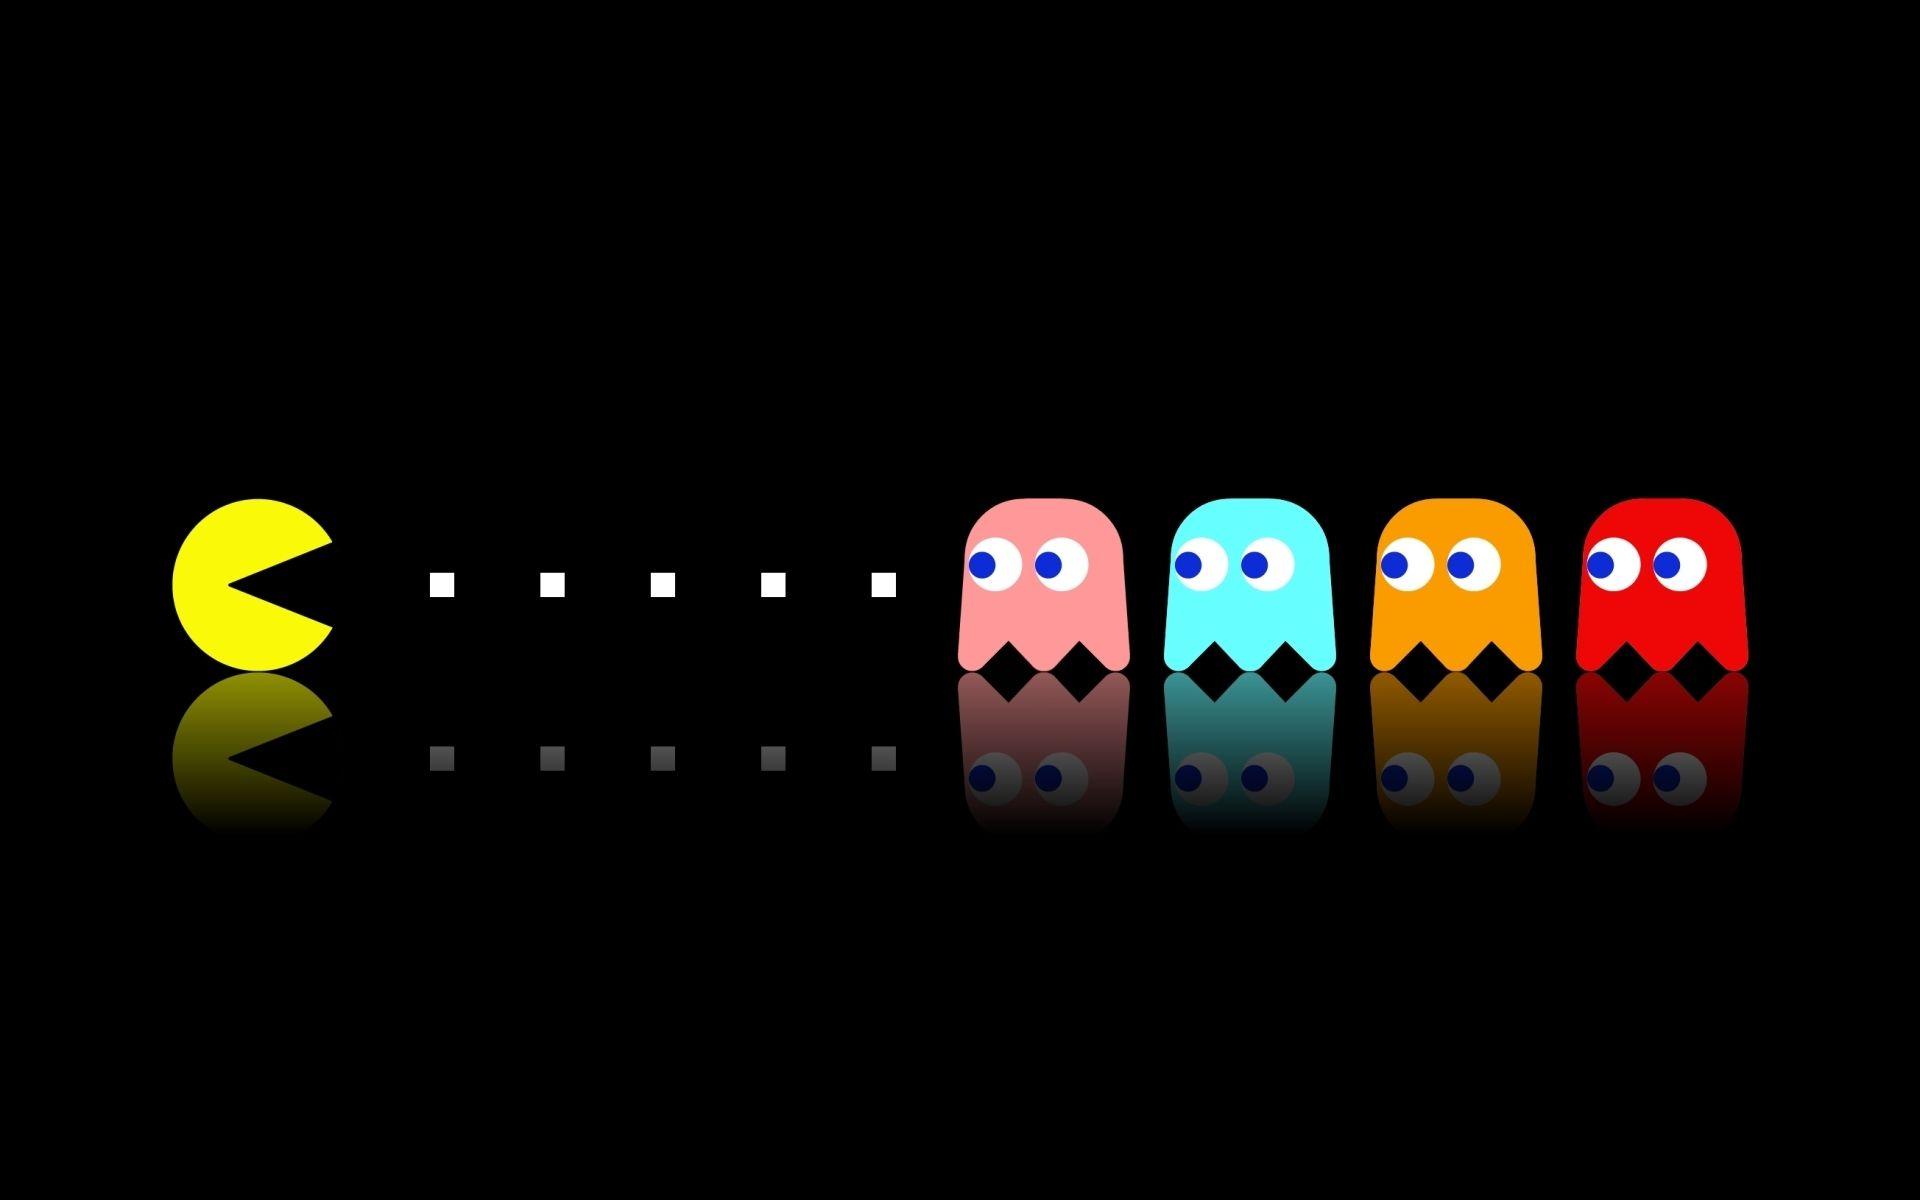 Pacman Iphone 6 Wallpaper Hd: Pacman Hd 1920x1200 - Imagenes - Wallpapers